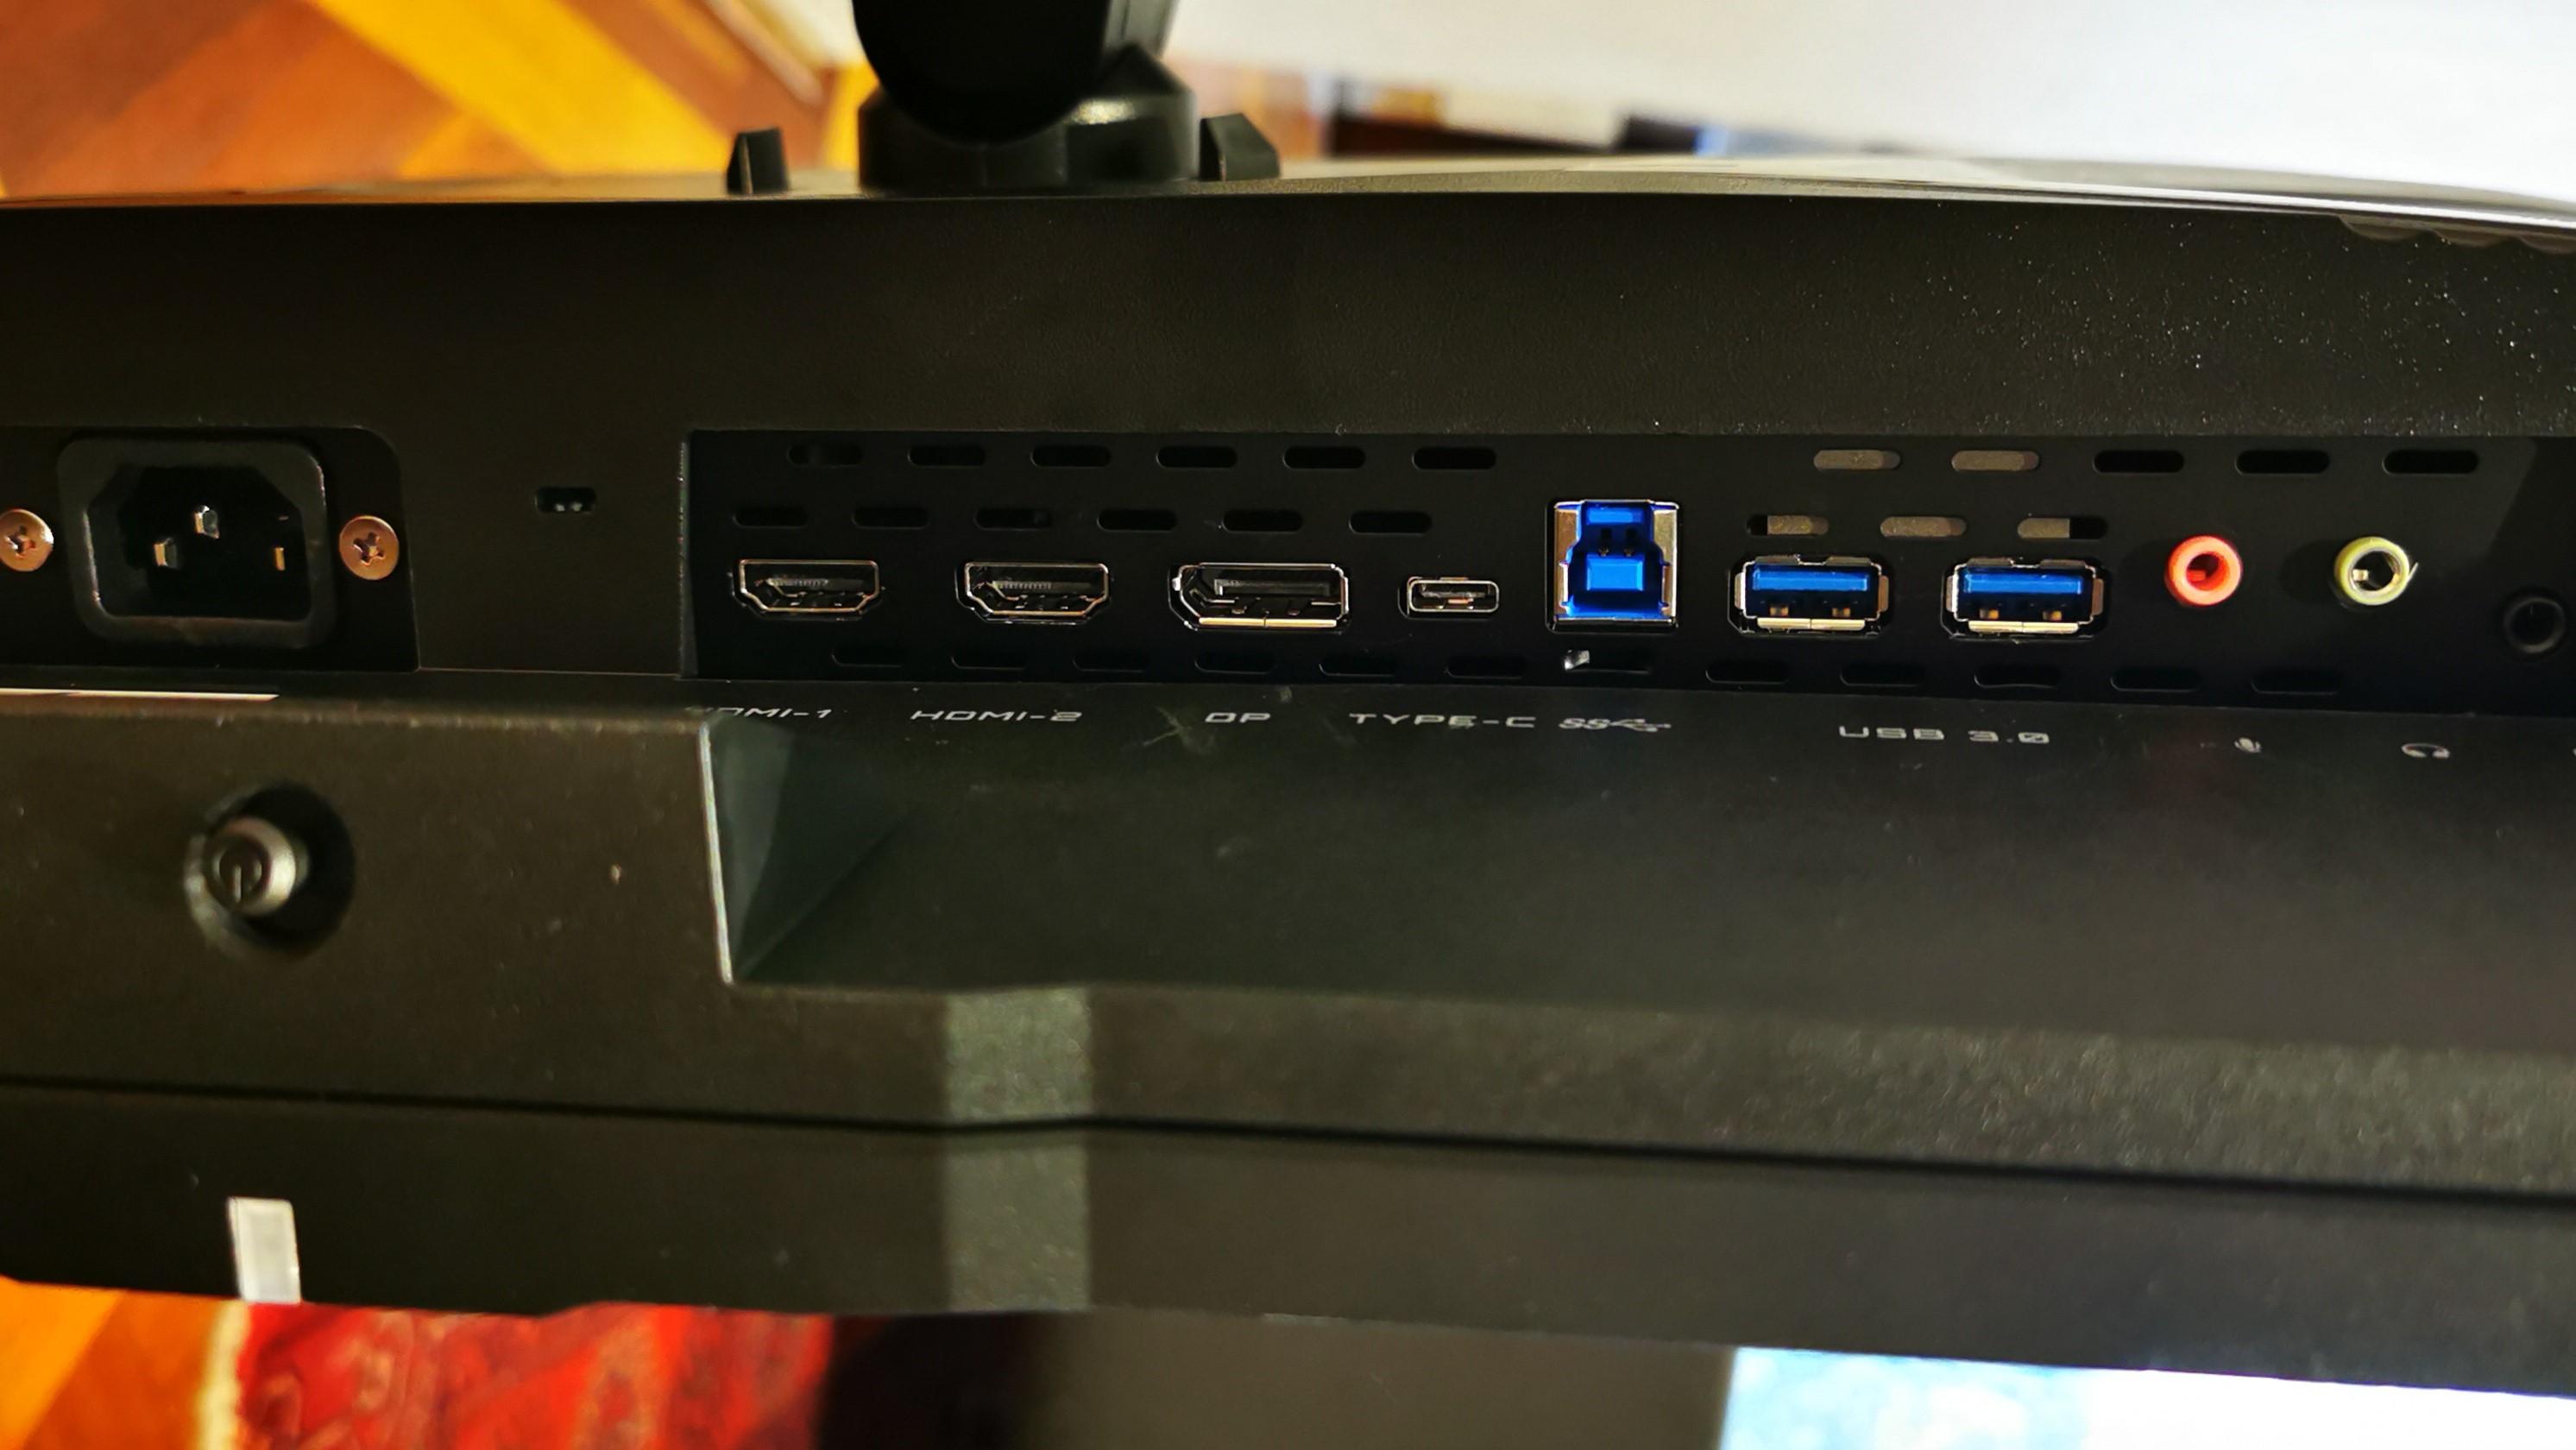 Gigabyte Aorus FI32U light ports